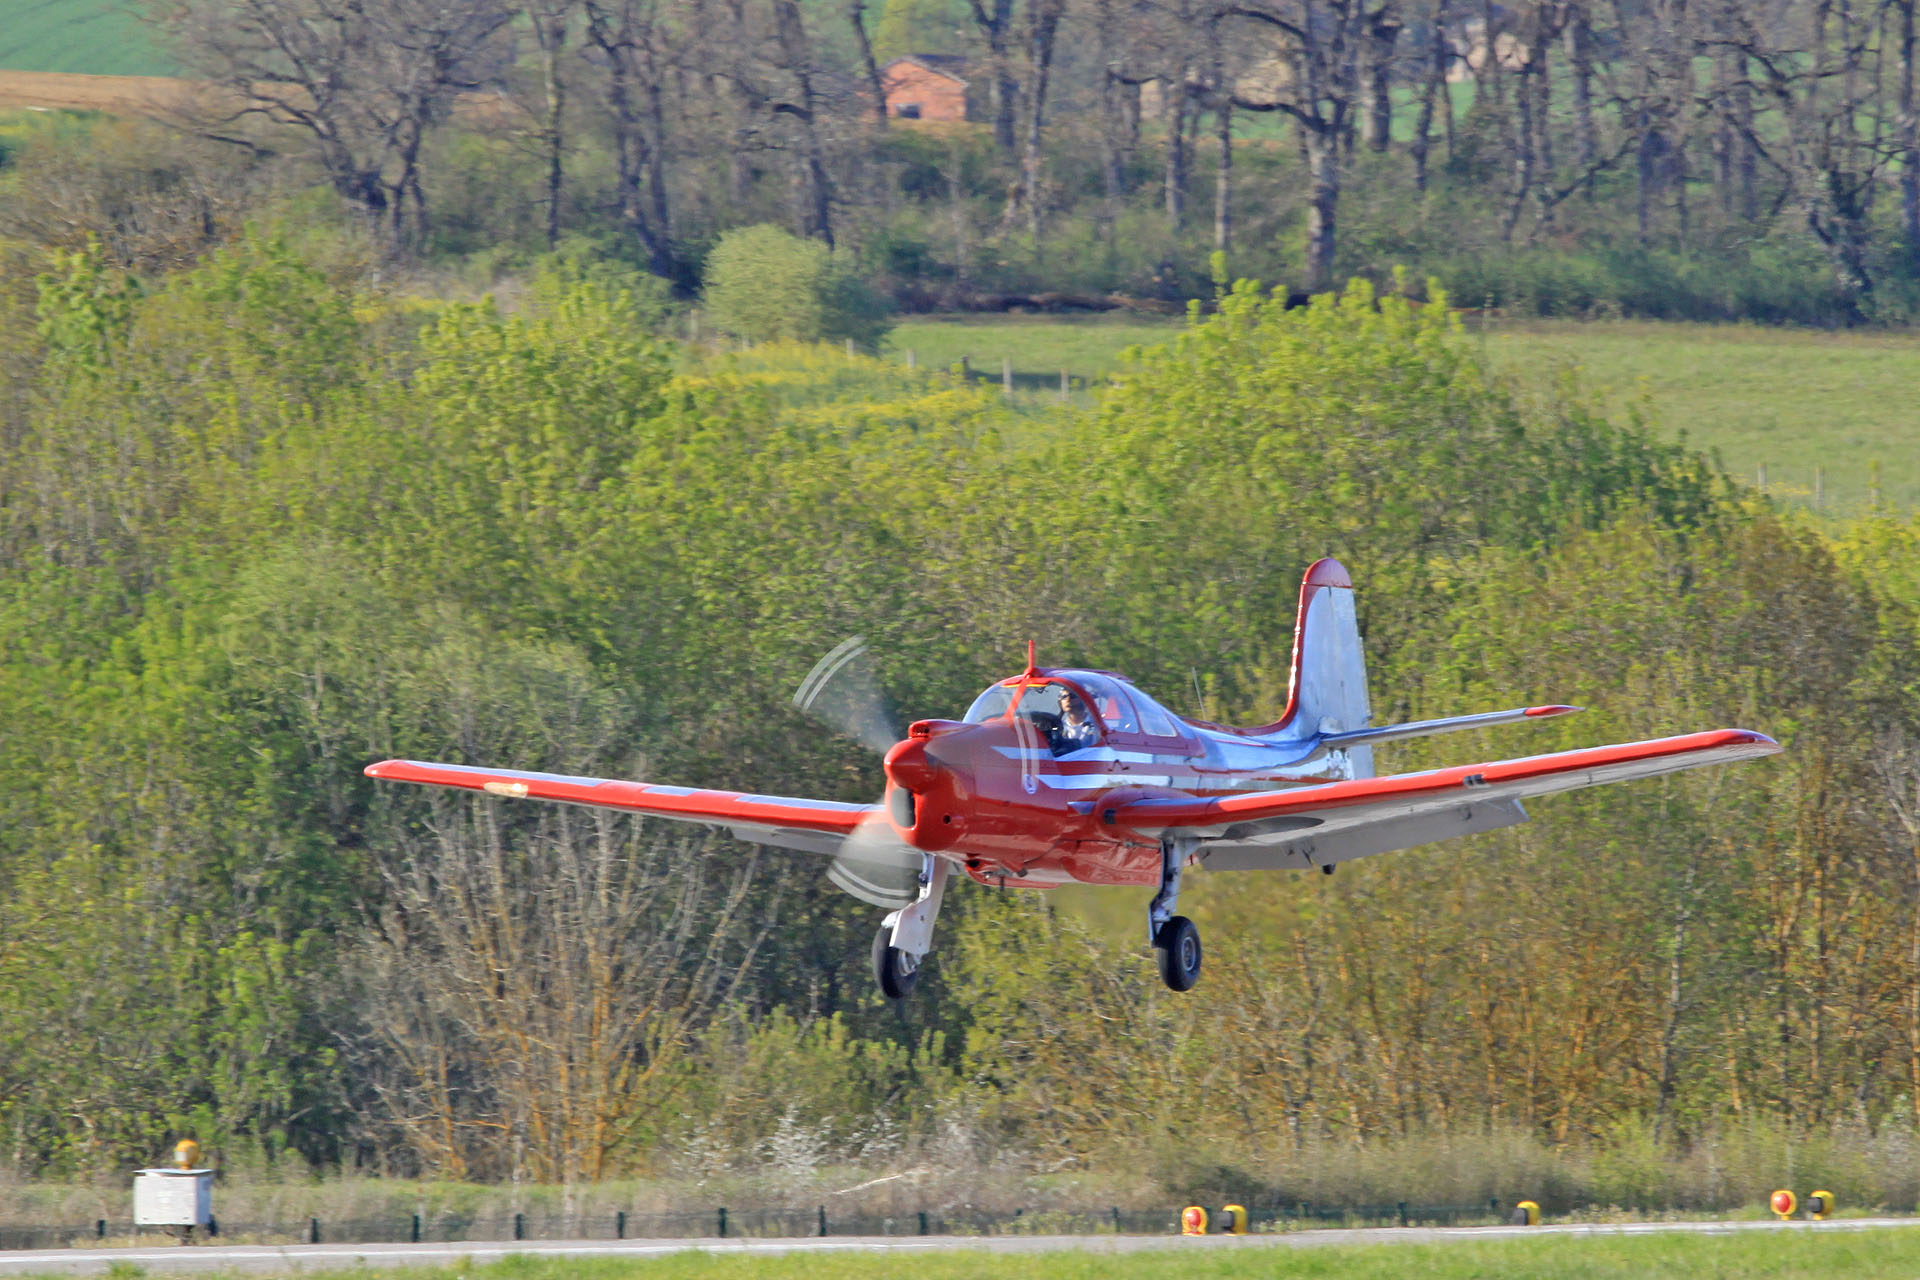 Morane-Saulnier MS.733 n°134 F-WYOT ( Photo © Vintage Aircraft Midi Pyrénées )